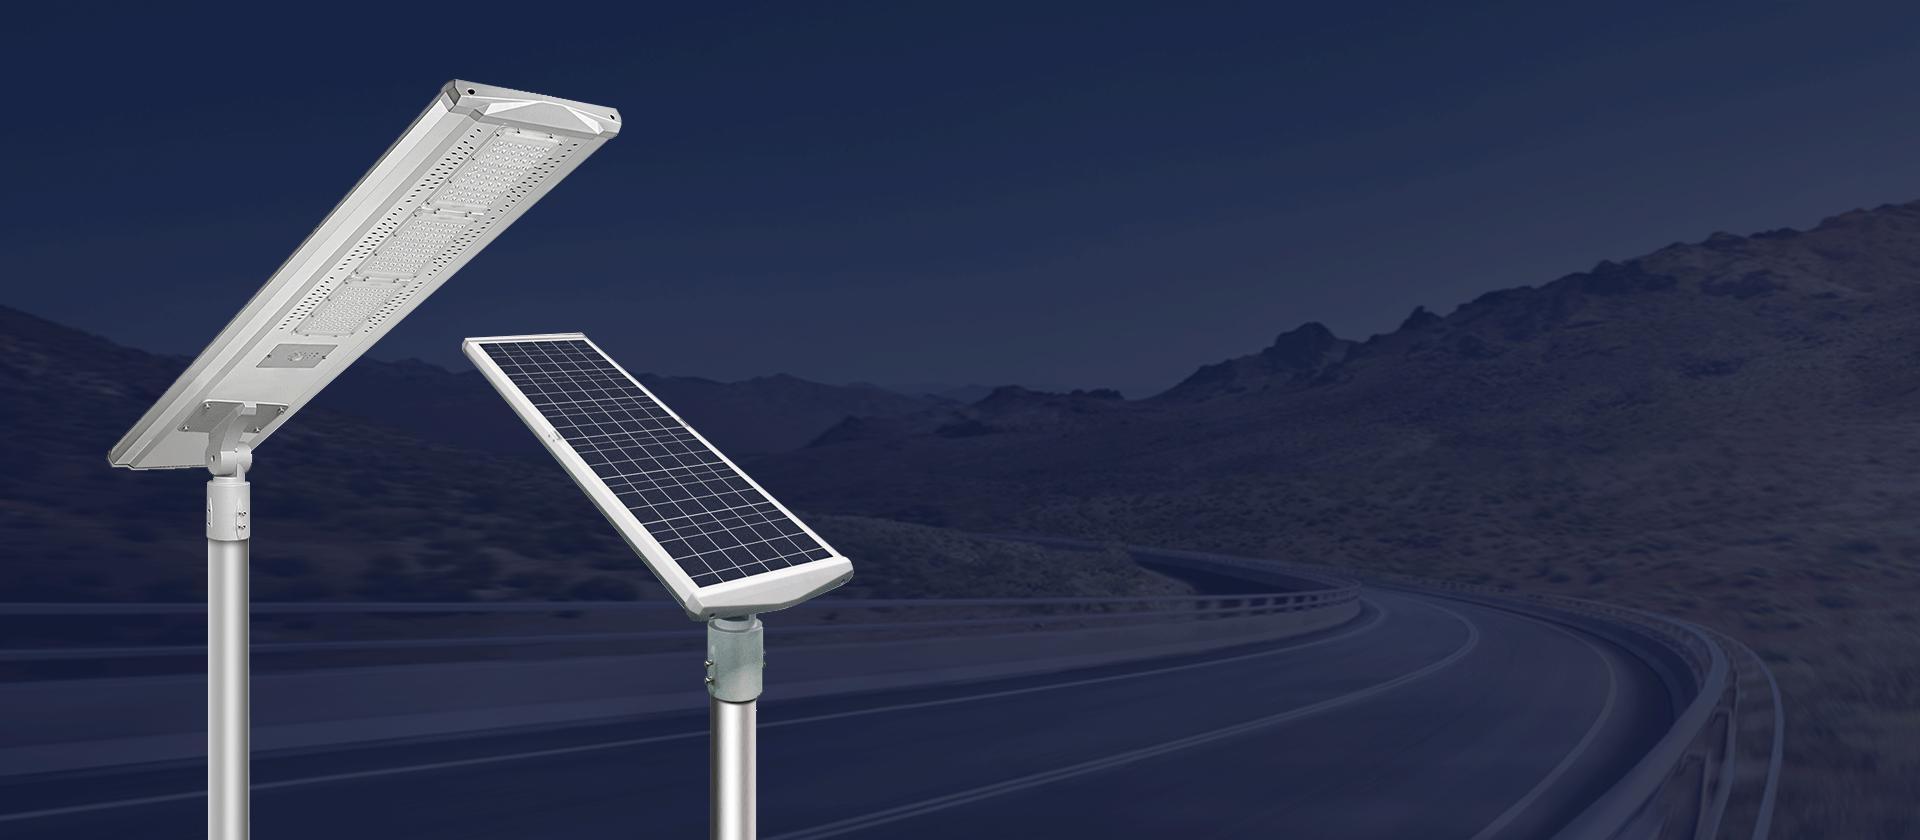 css-solar (@css-solar) Cover Image